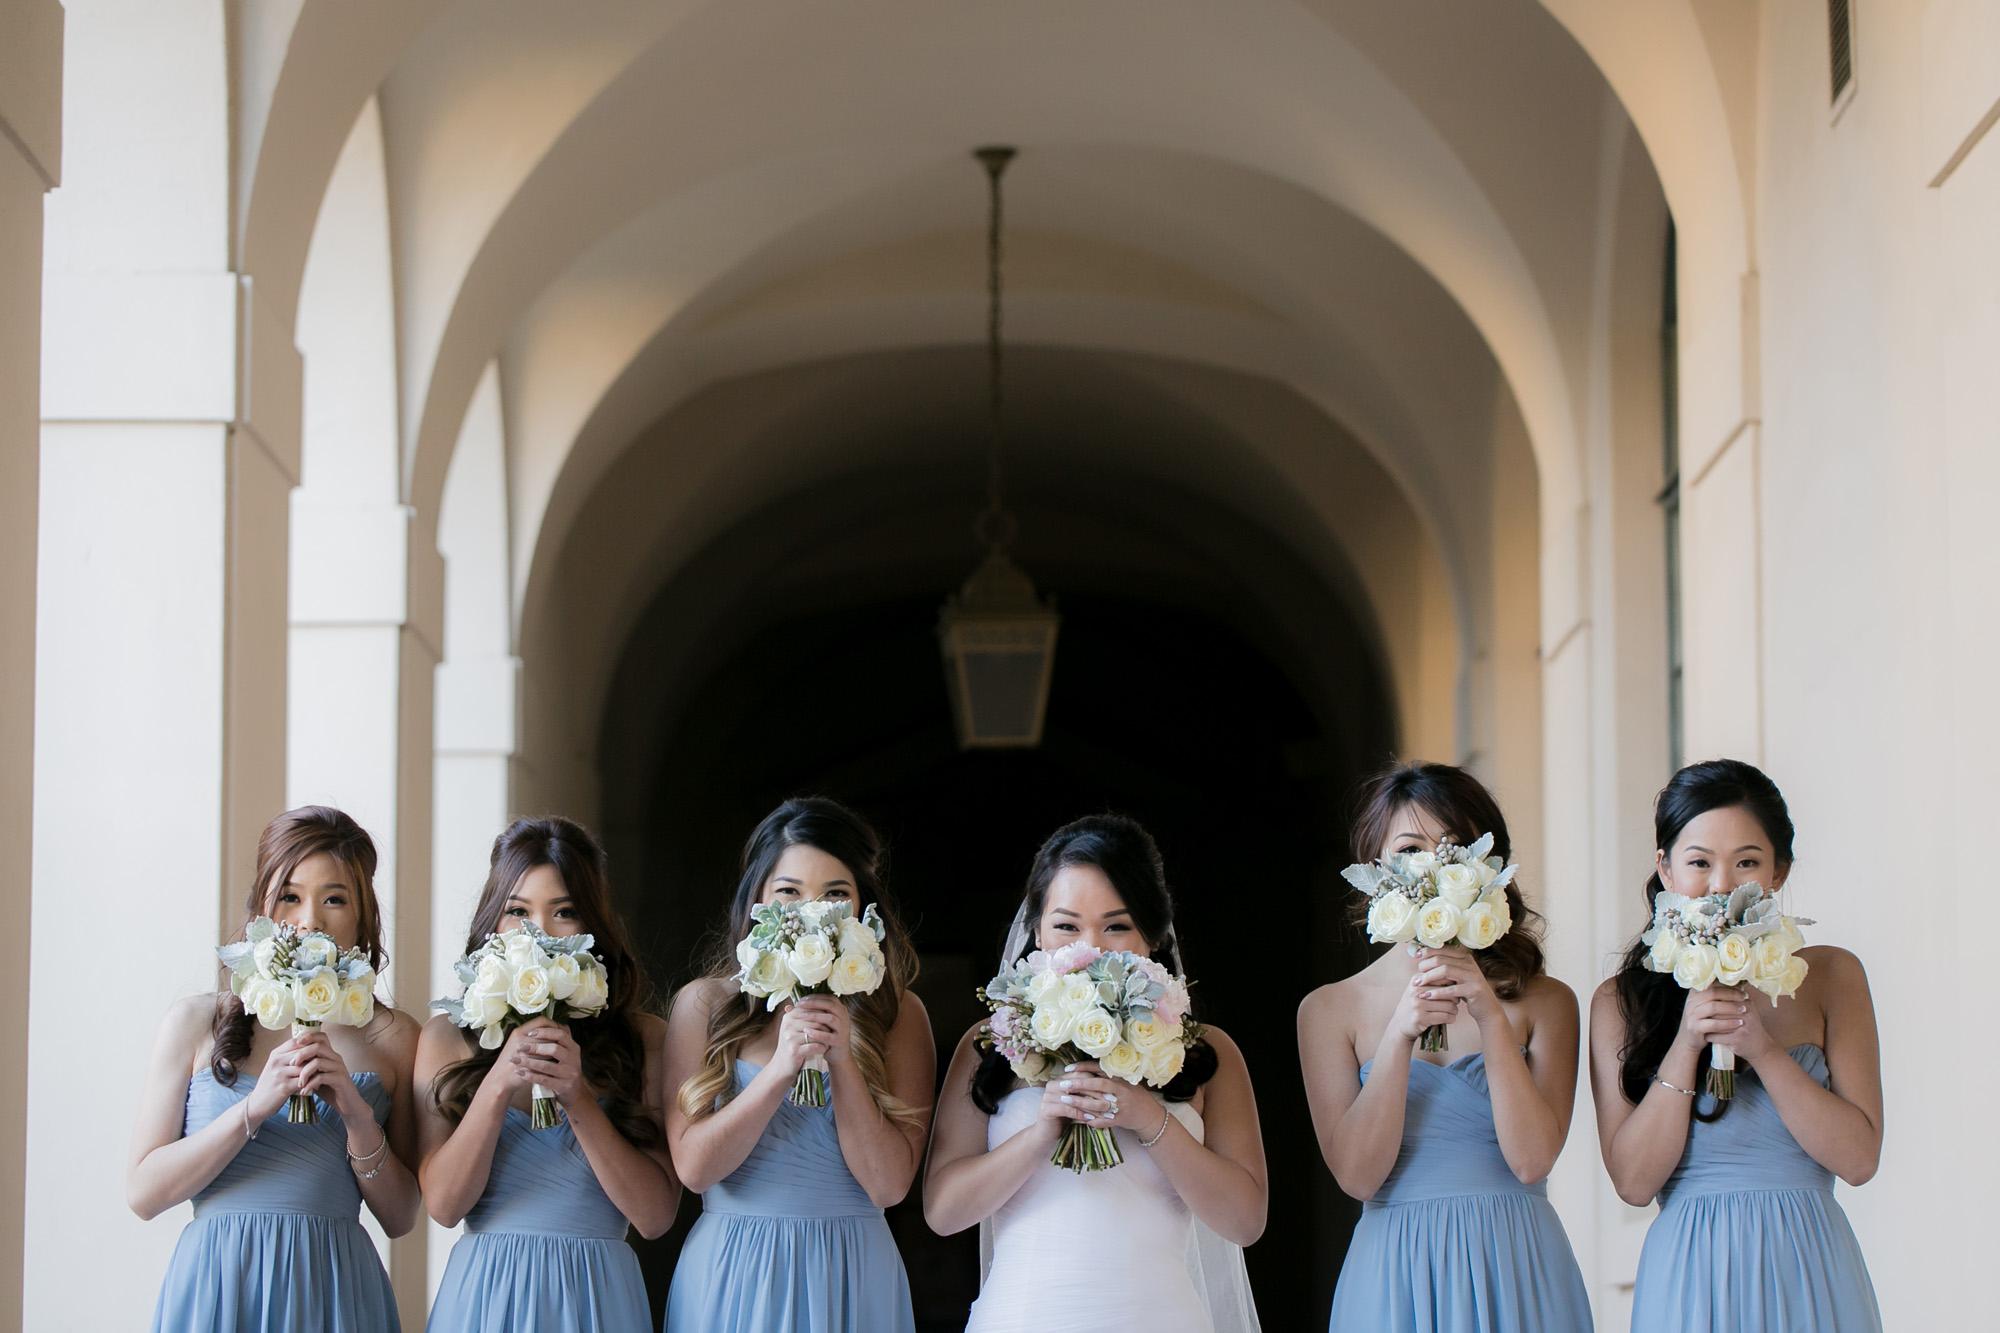 Geoff Kowalchuk JT Wedding Photo-015.jpg